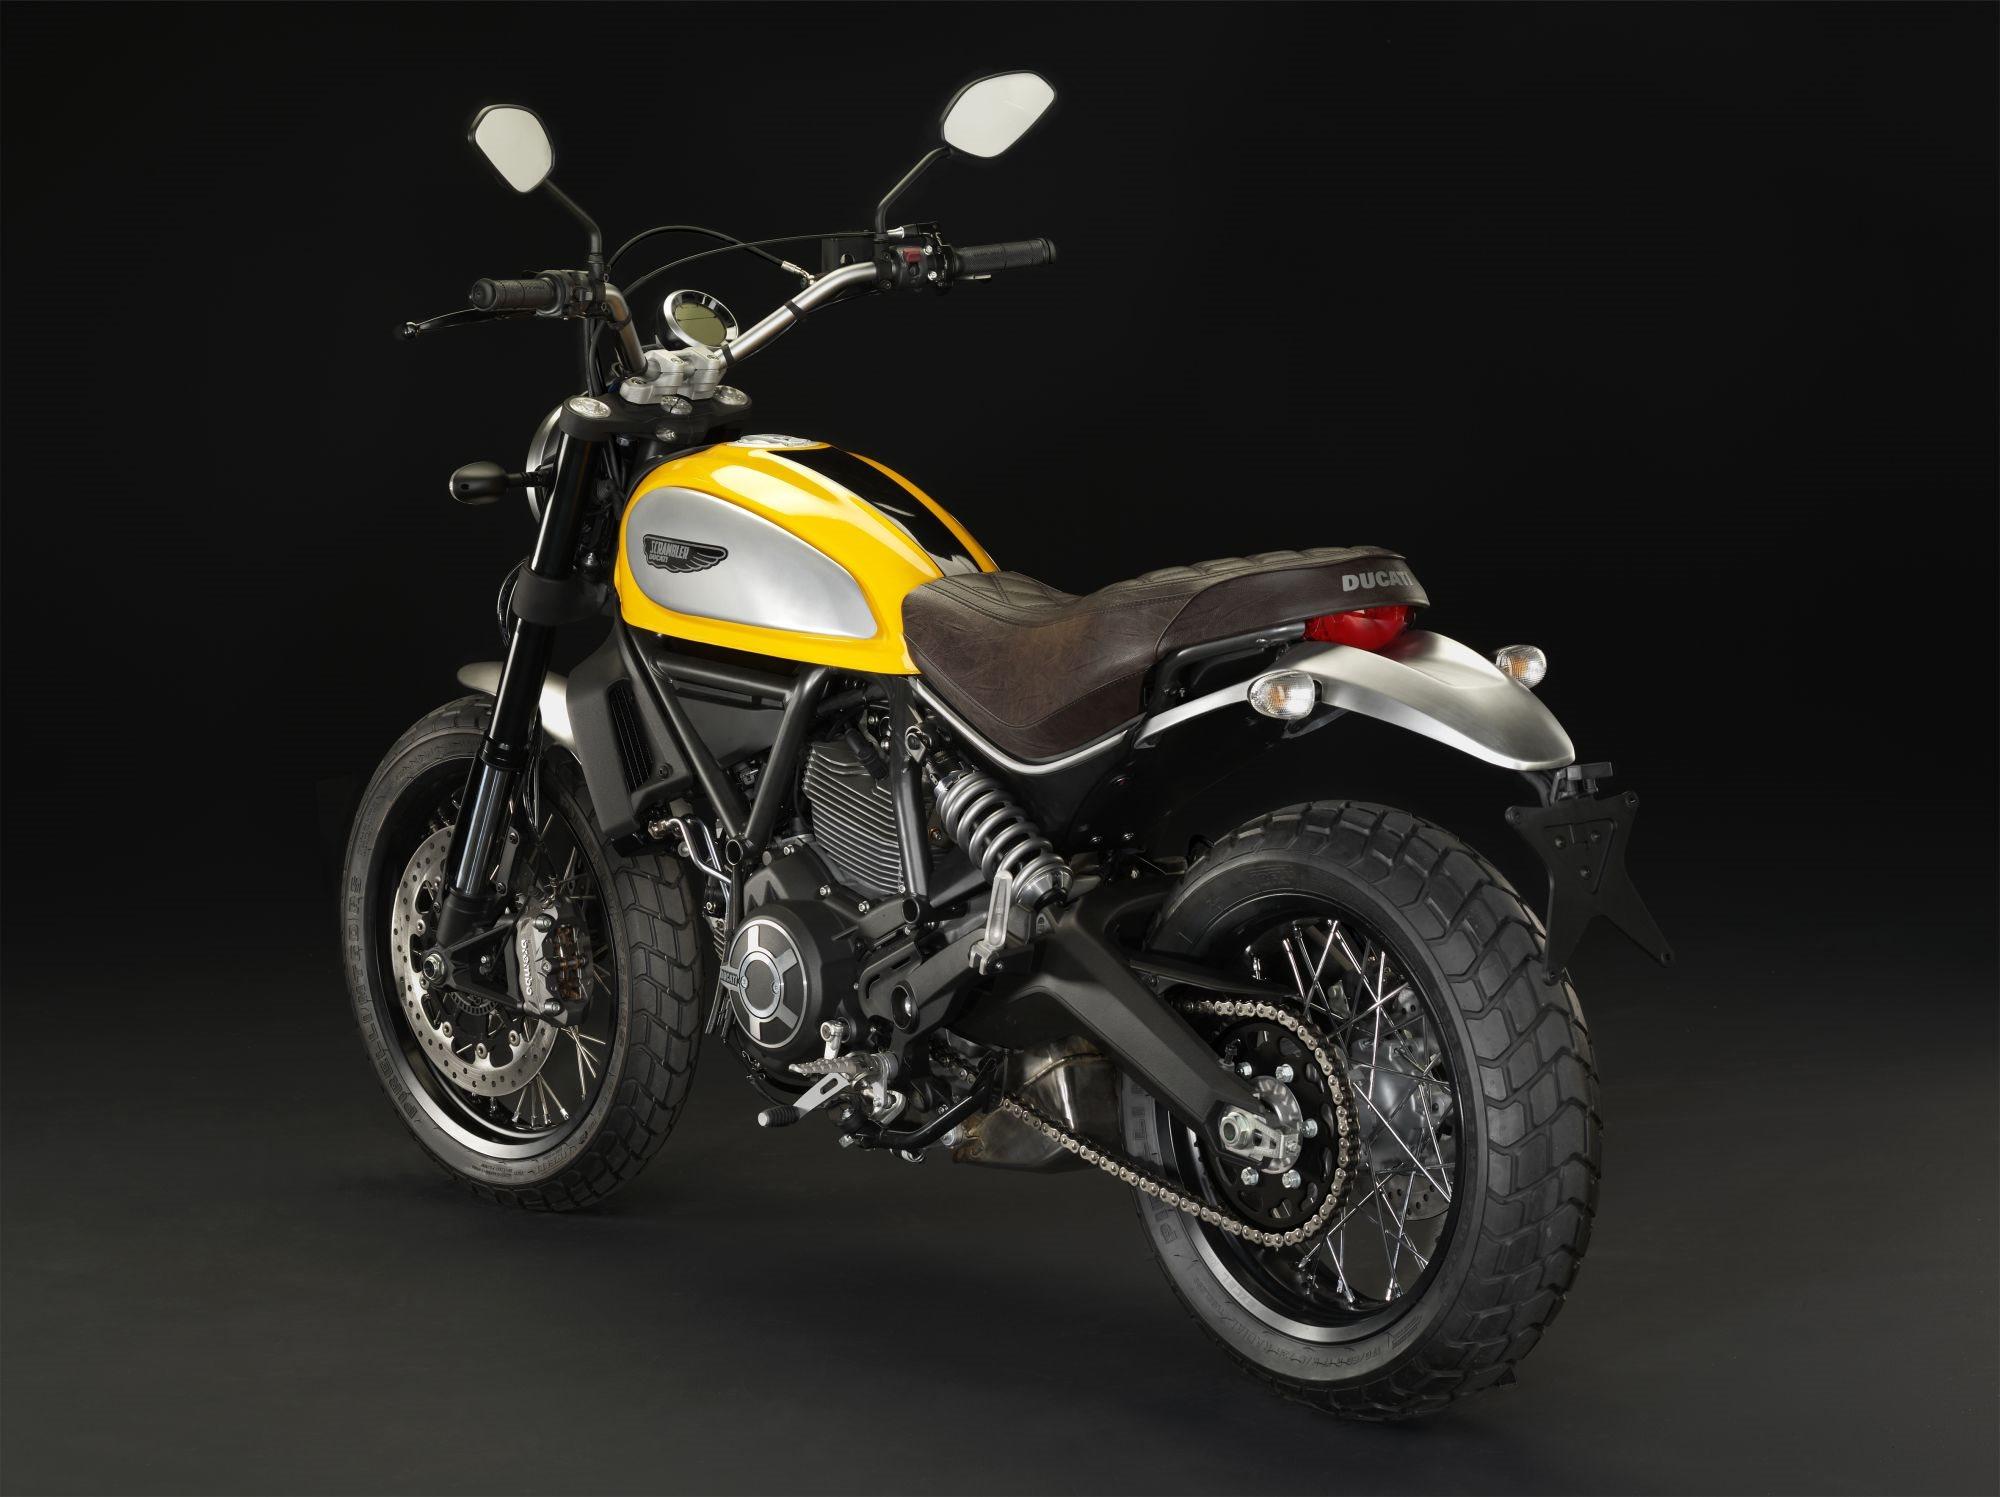 МОТОЦИКЛ DUCATI SCRAMBLER CLASSIC ― Артмото - купить квадроцикл в украине и харькове, мотоцикл, снегоход, скутер, мопед, электромобиль